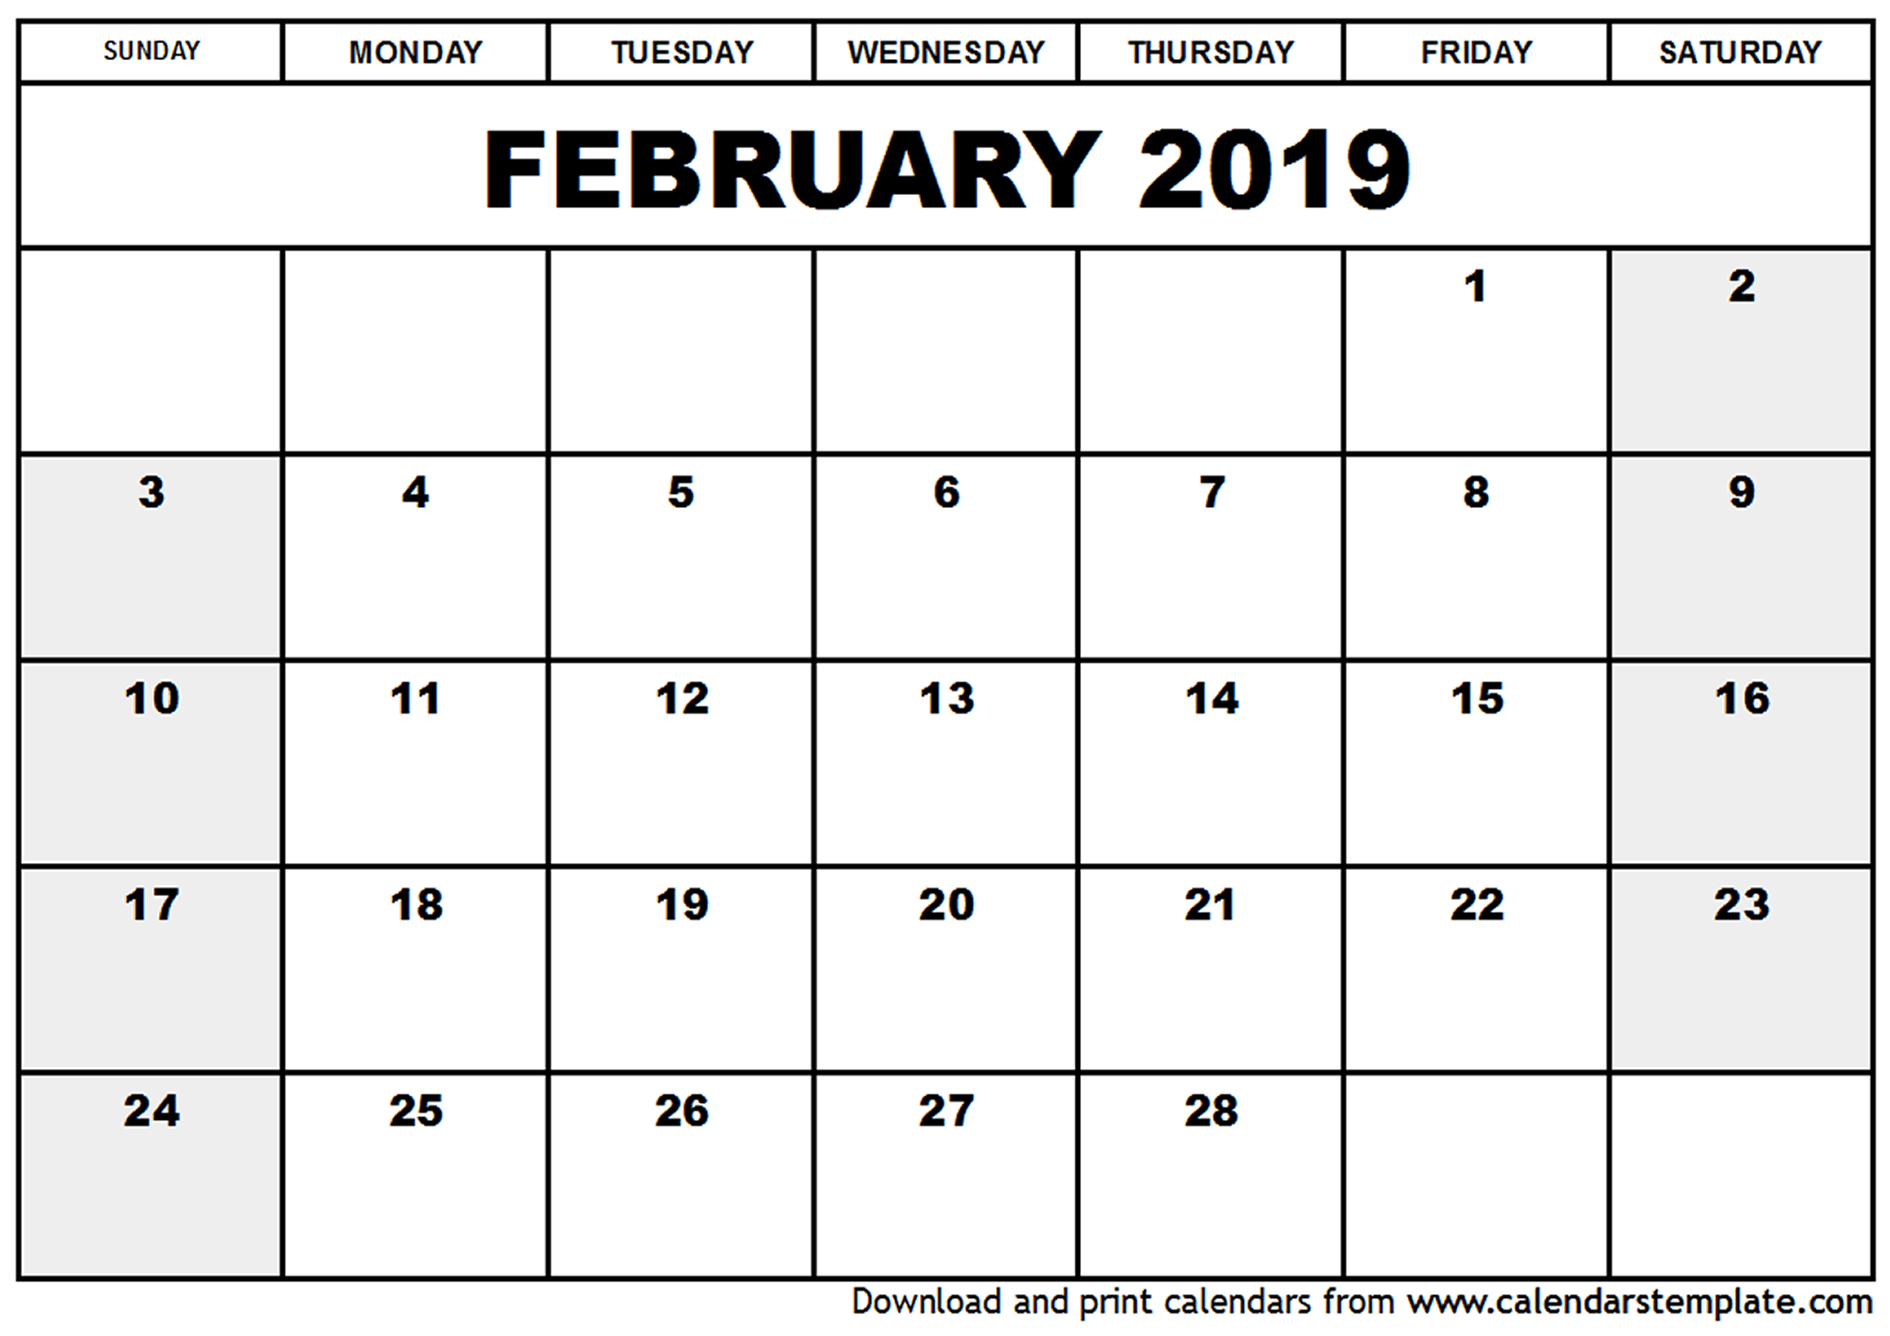 February 2019 Blank Calendar Printable Template